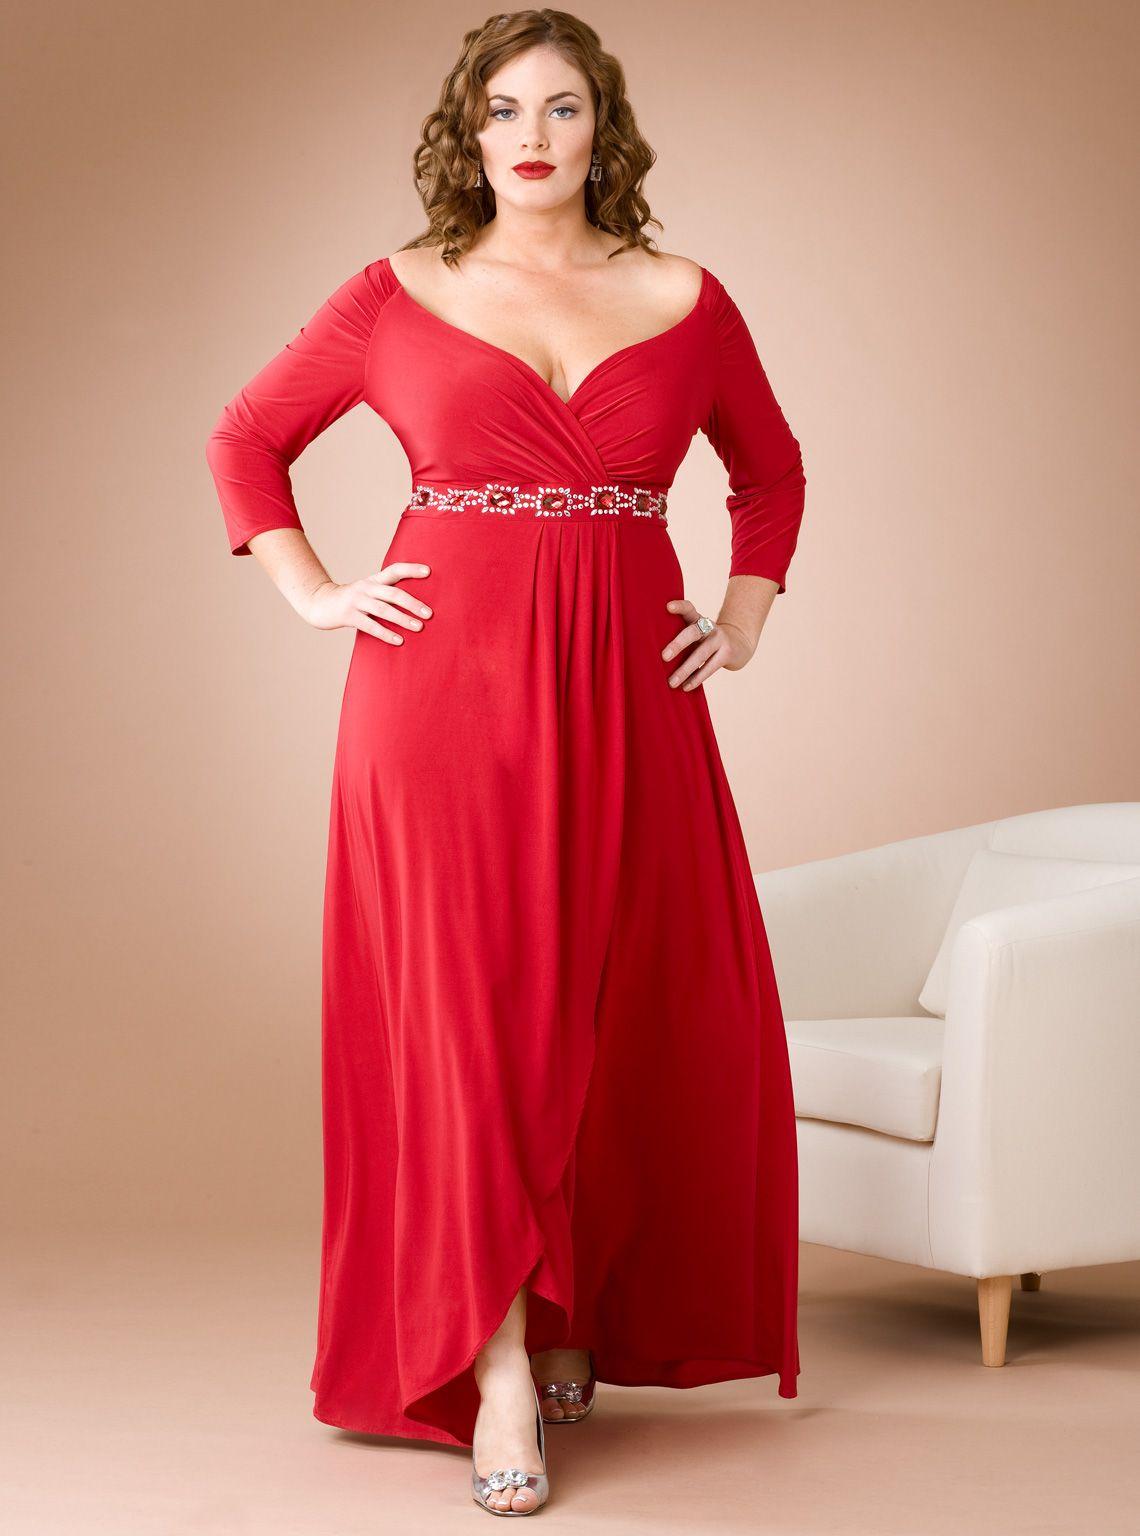 Elegant plus size dresses in color red